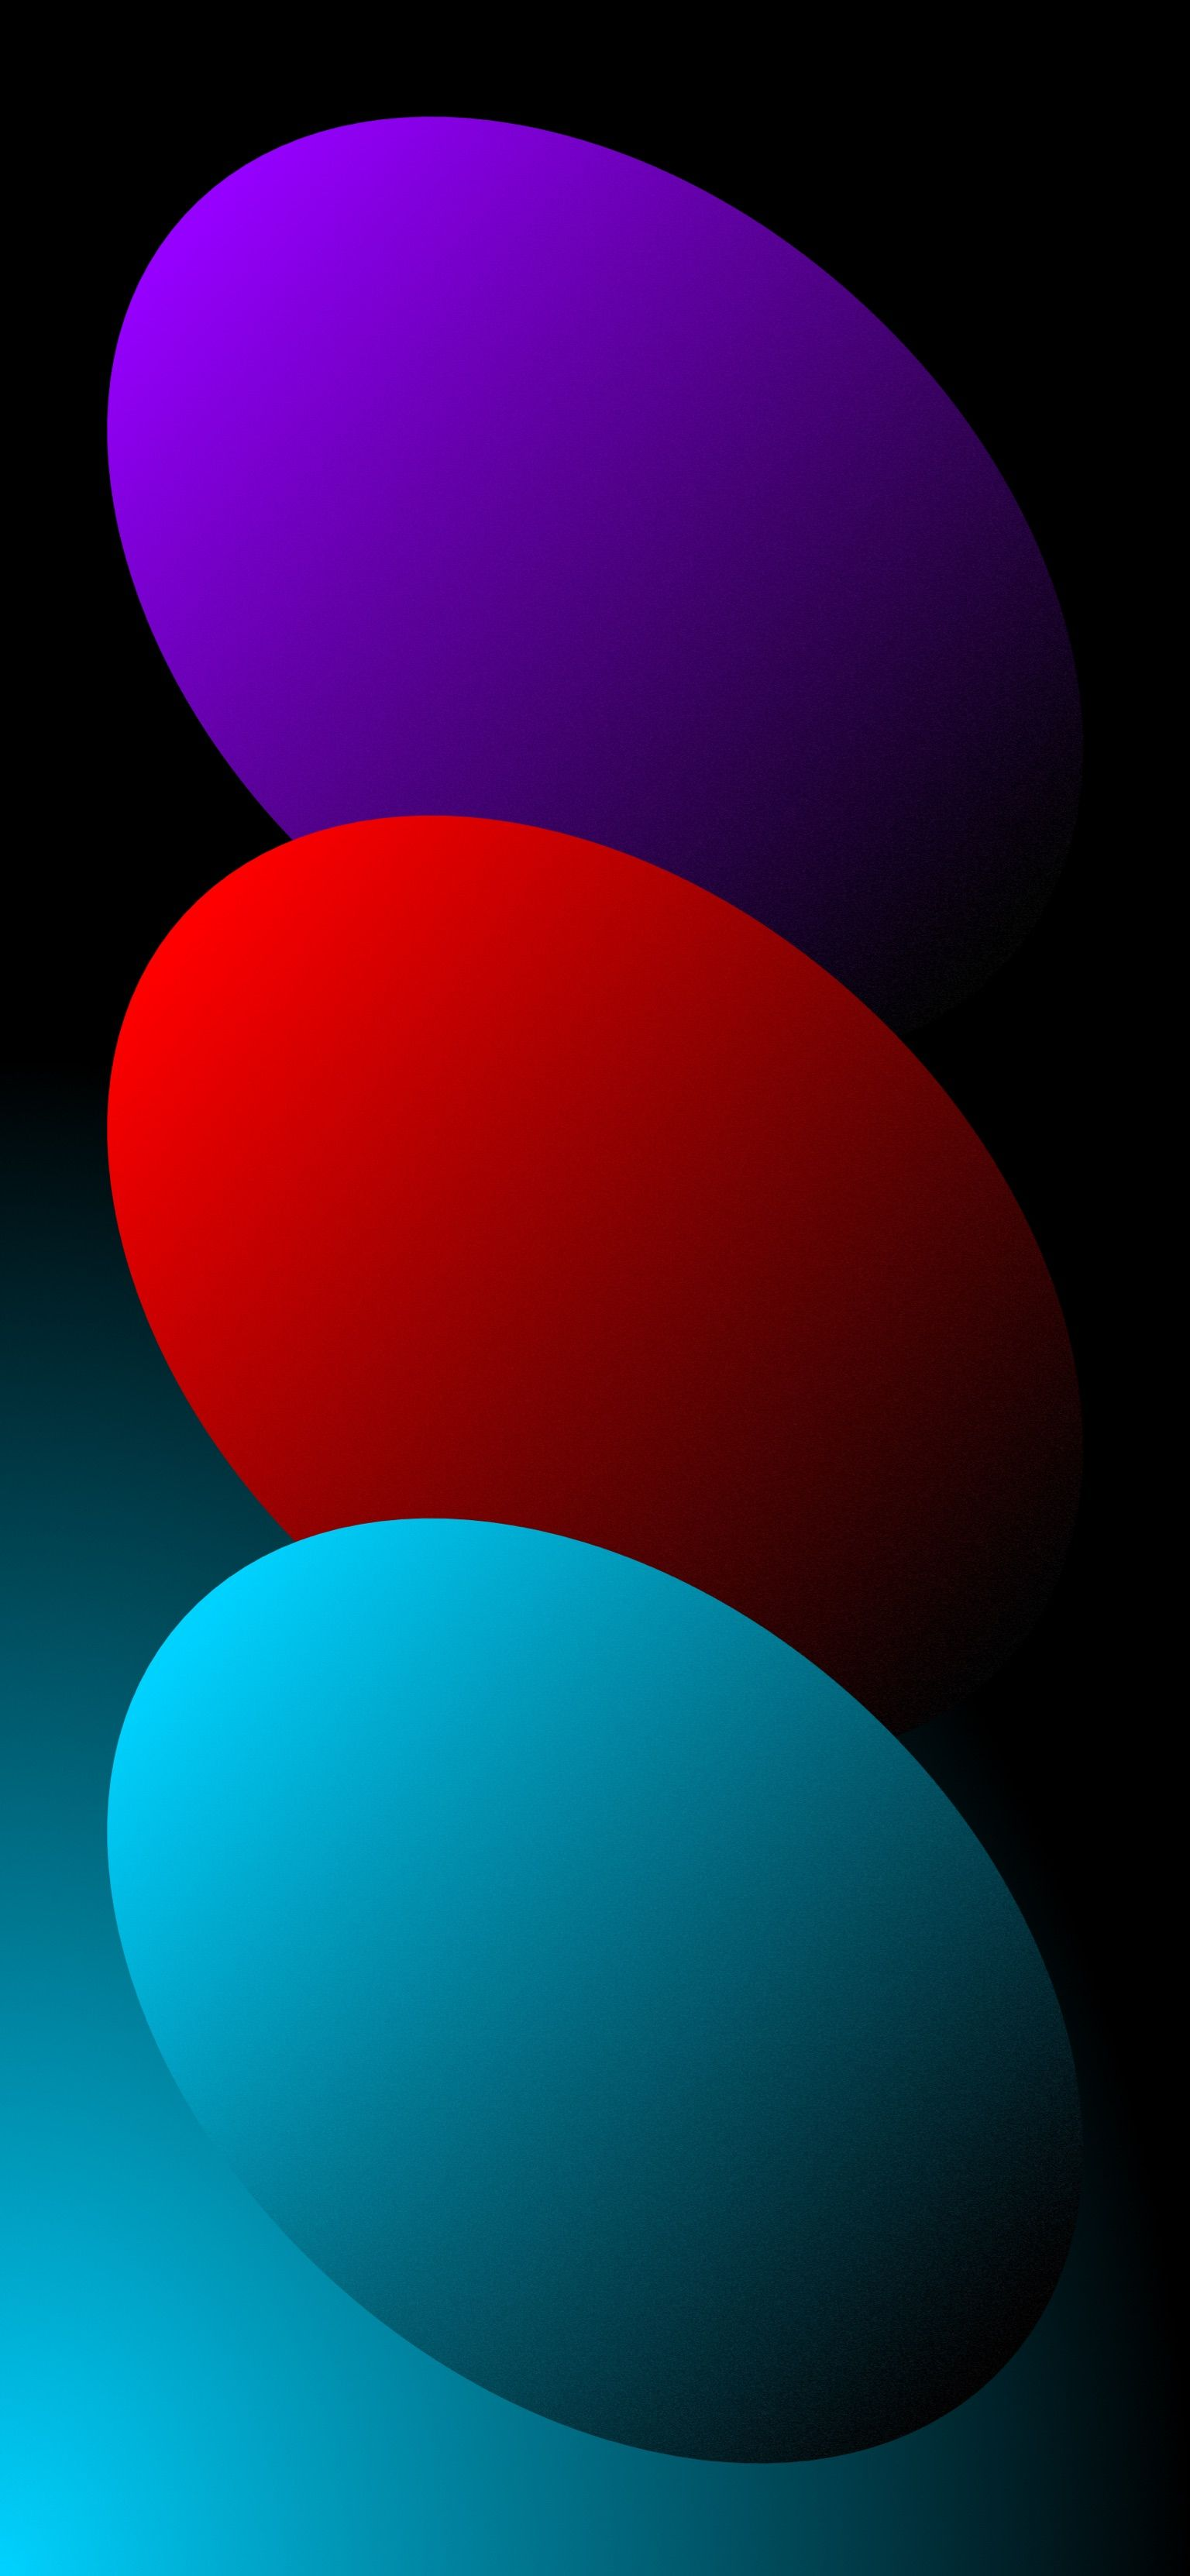 Hd Wallpaper Designed By Hotspot4u Img 0400 Jpg Google Drive Iphone Wallpaper Ocean Iphone Wallpaper Music Abstract Wallpaper Backgrounds